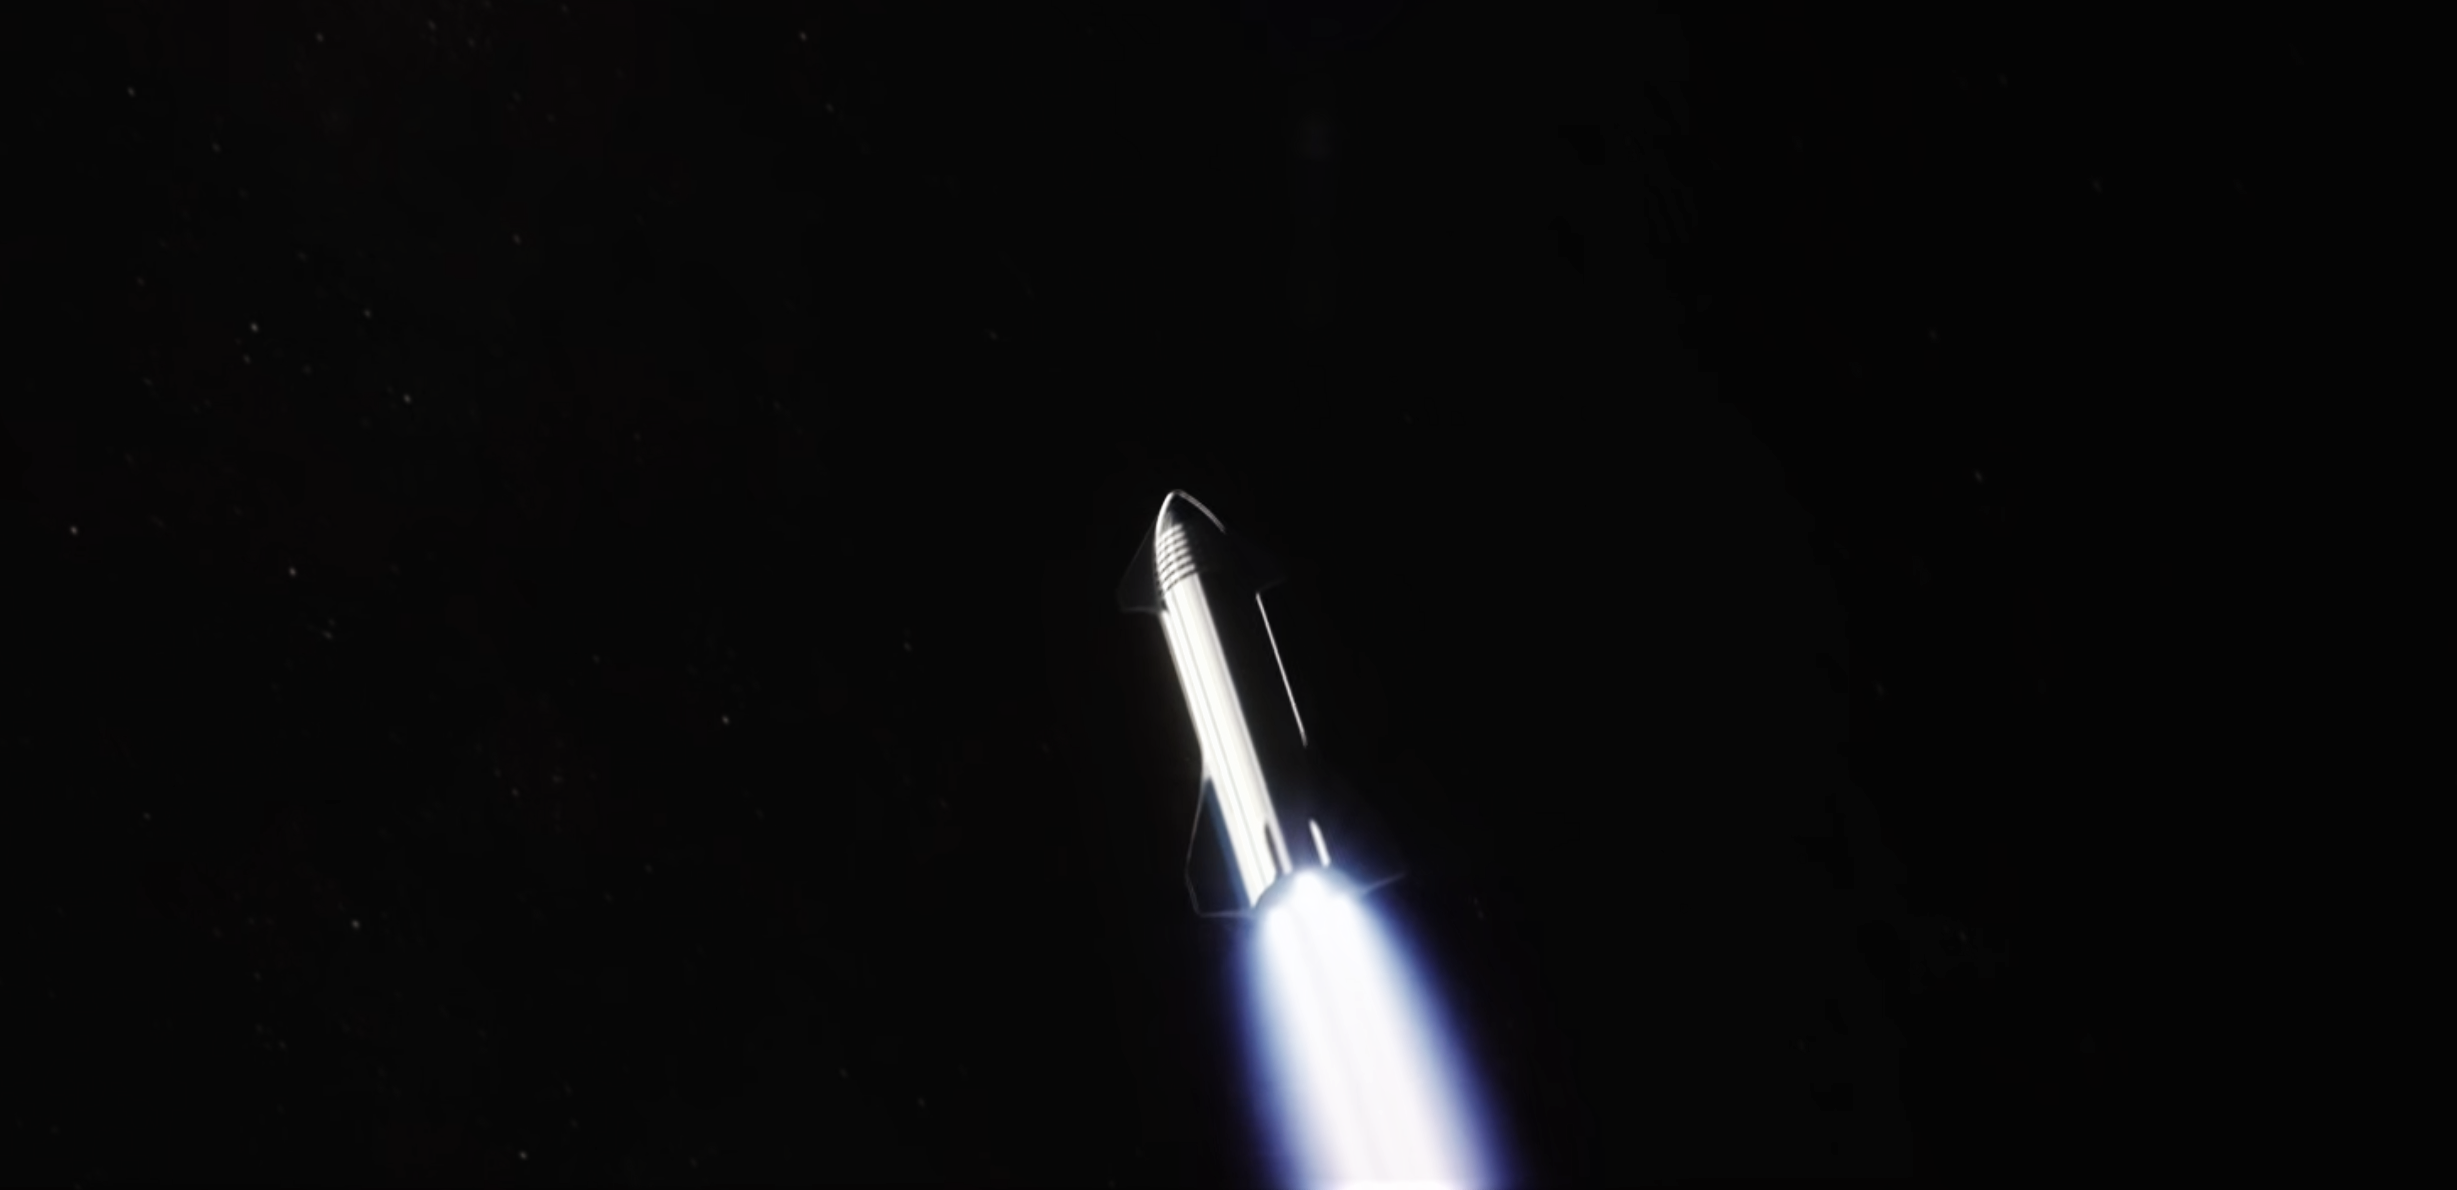 Starship Super Heavy 2019 (SpaceX) orbit raising 1 crop 2